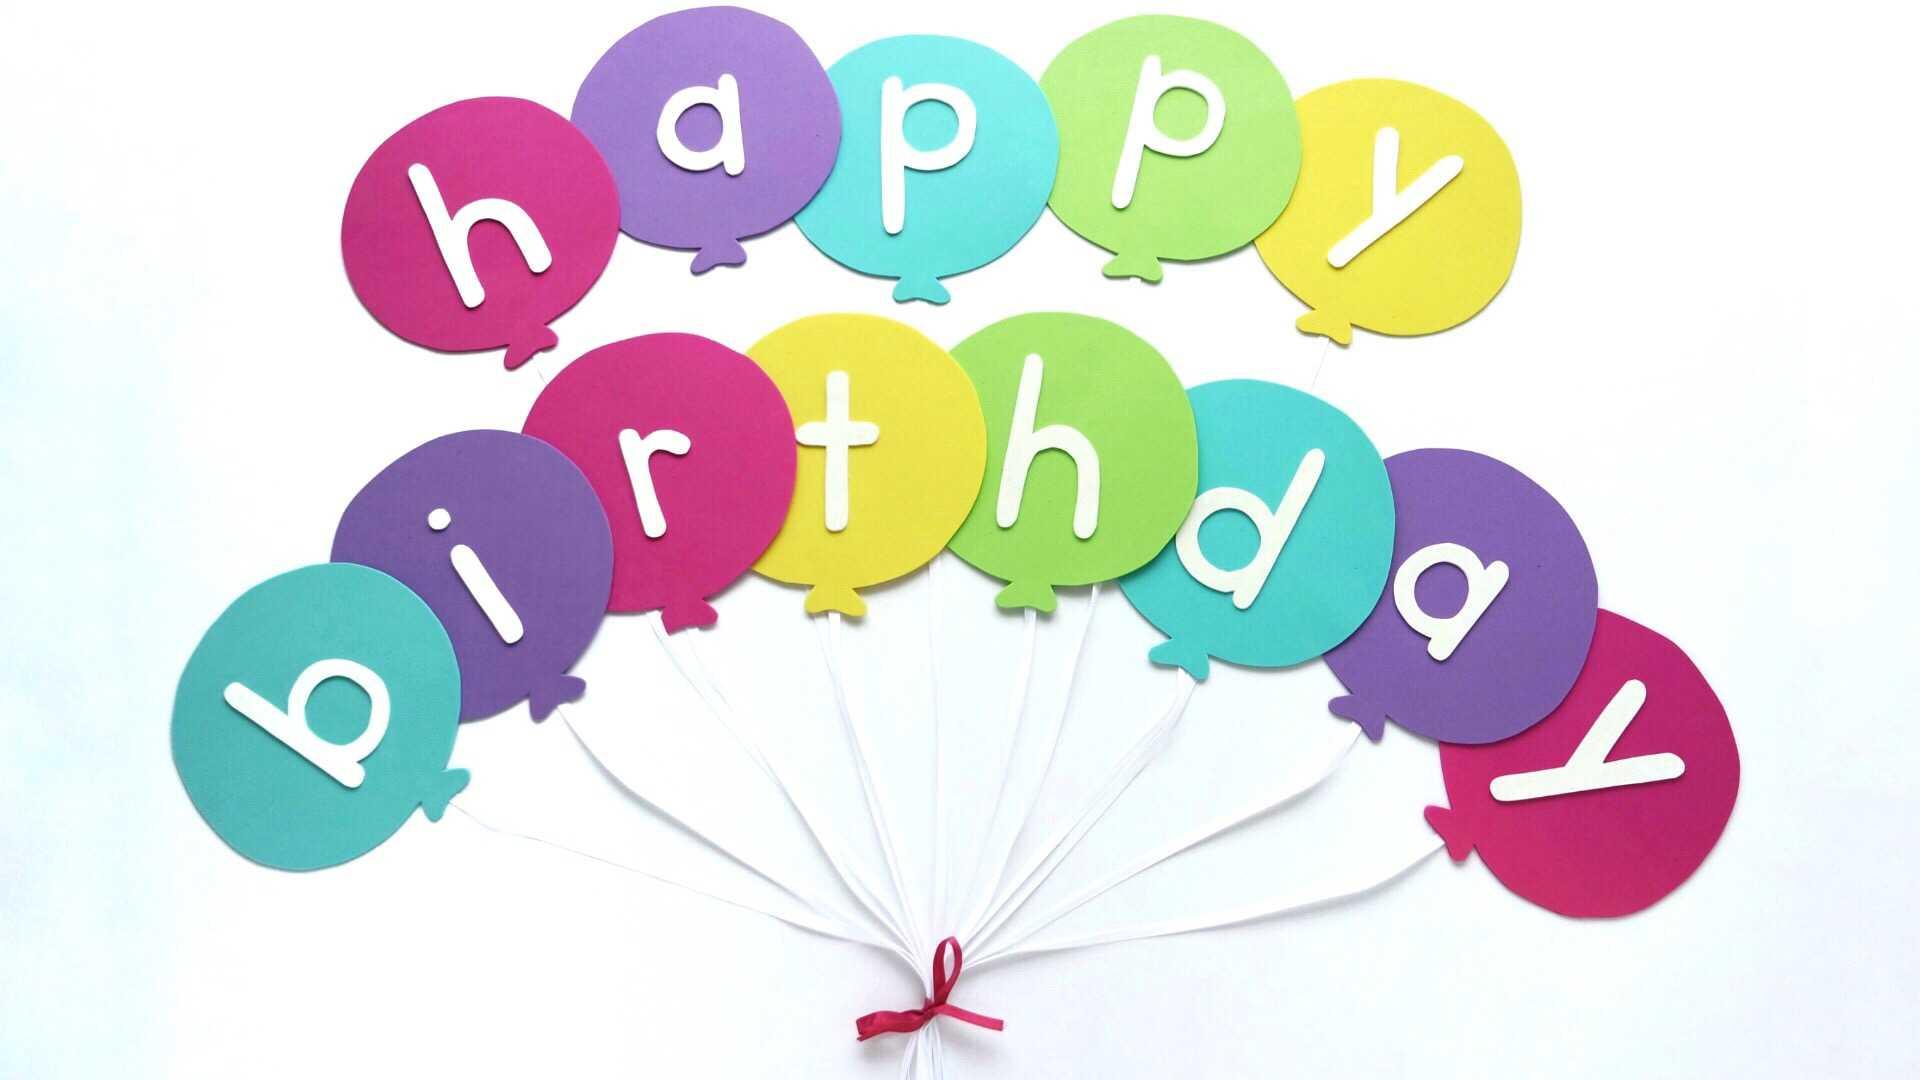 Happy Birthday Banner Diy Template   Balloon Birthday Banner Regarding Diy Birthday Banner Template